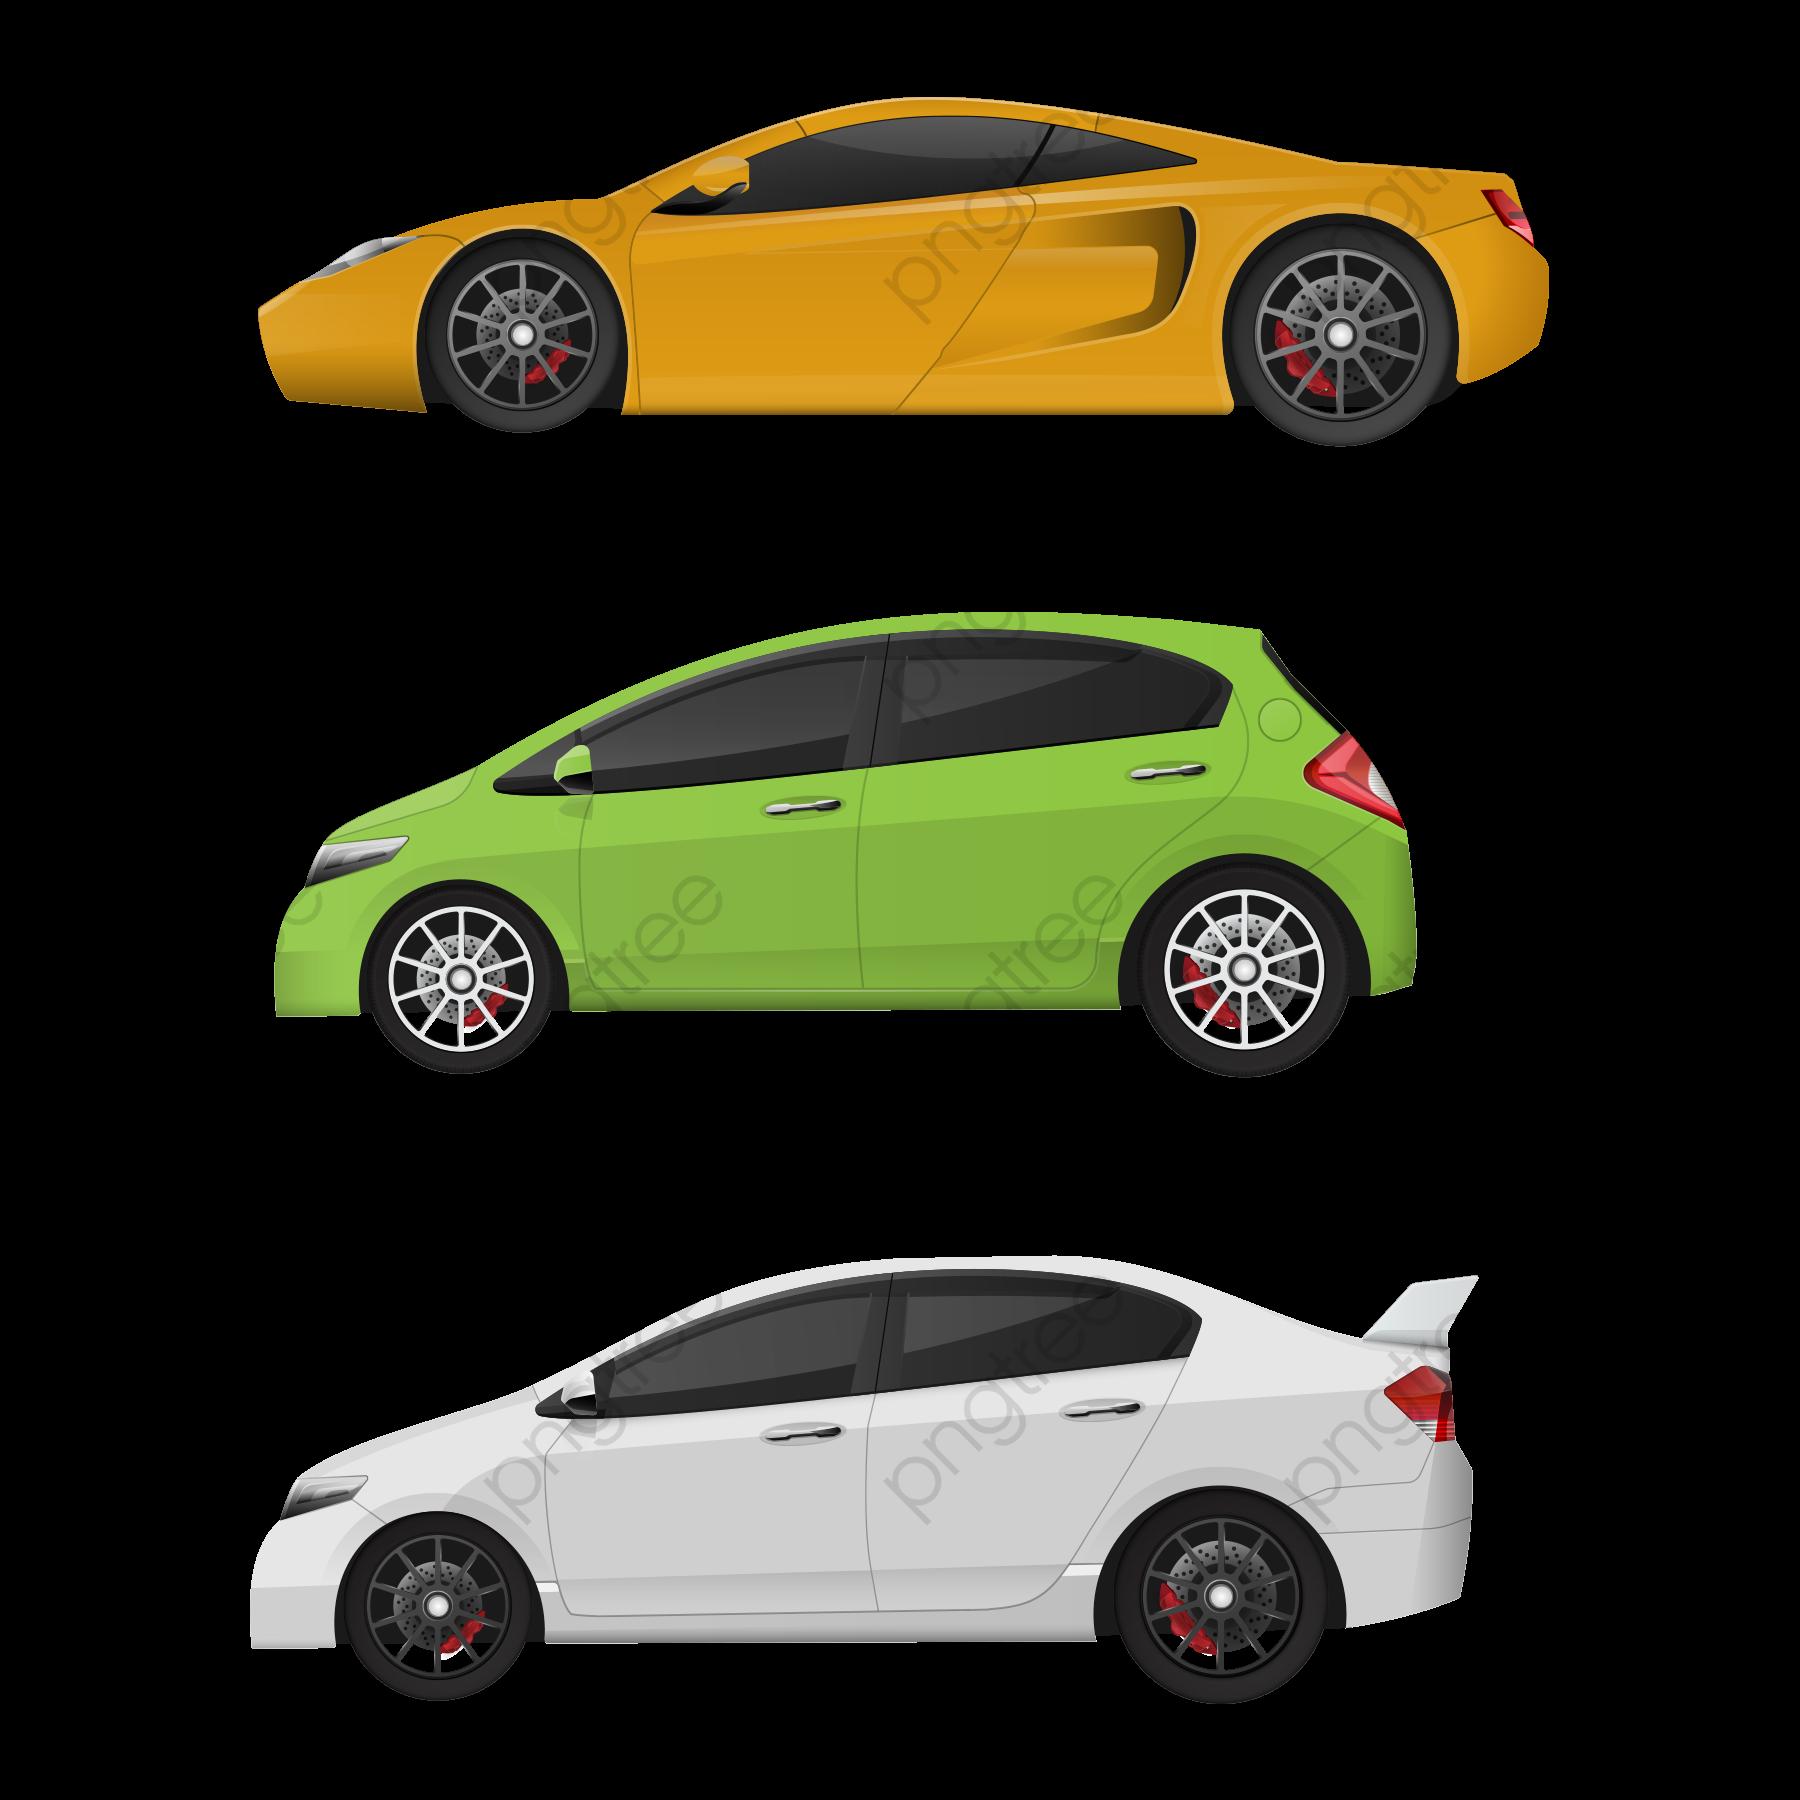 Car Racing Car Side View, Car Clipart, Car, Racing PNG and Vector.